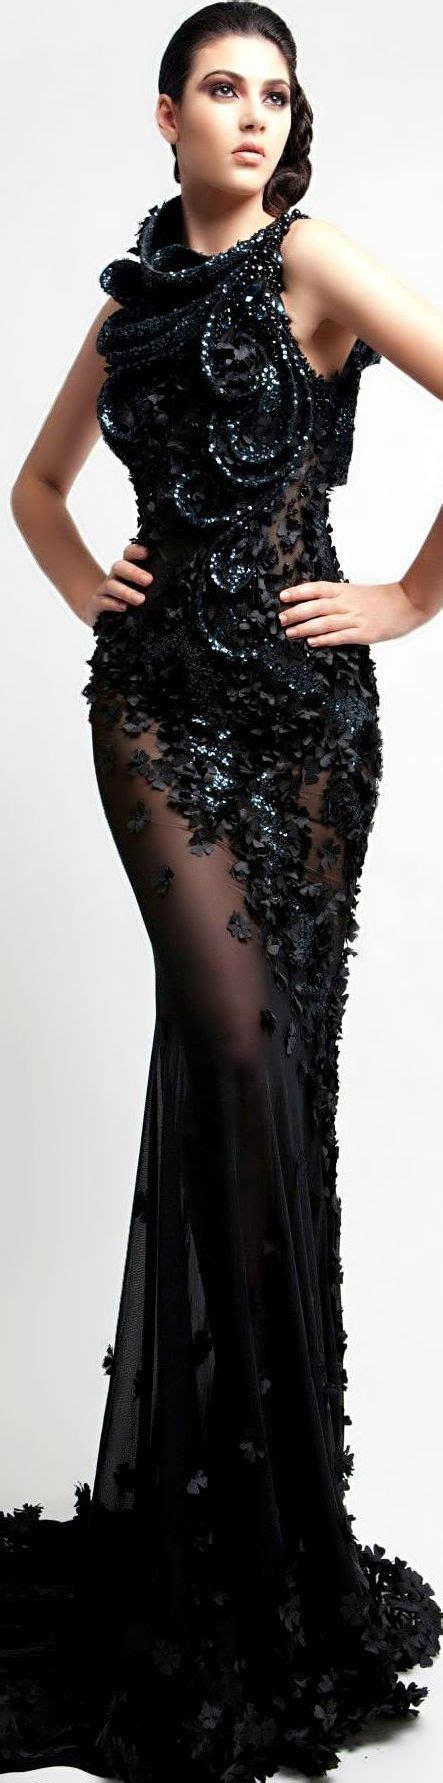 Dress Choco Leo leo almodal haute couture s s 2014 black dress